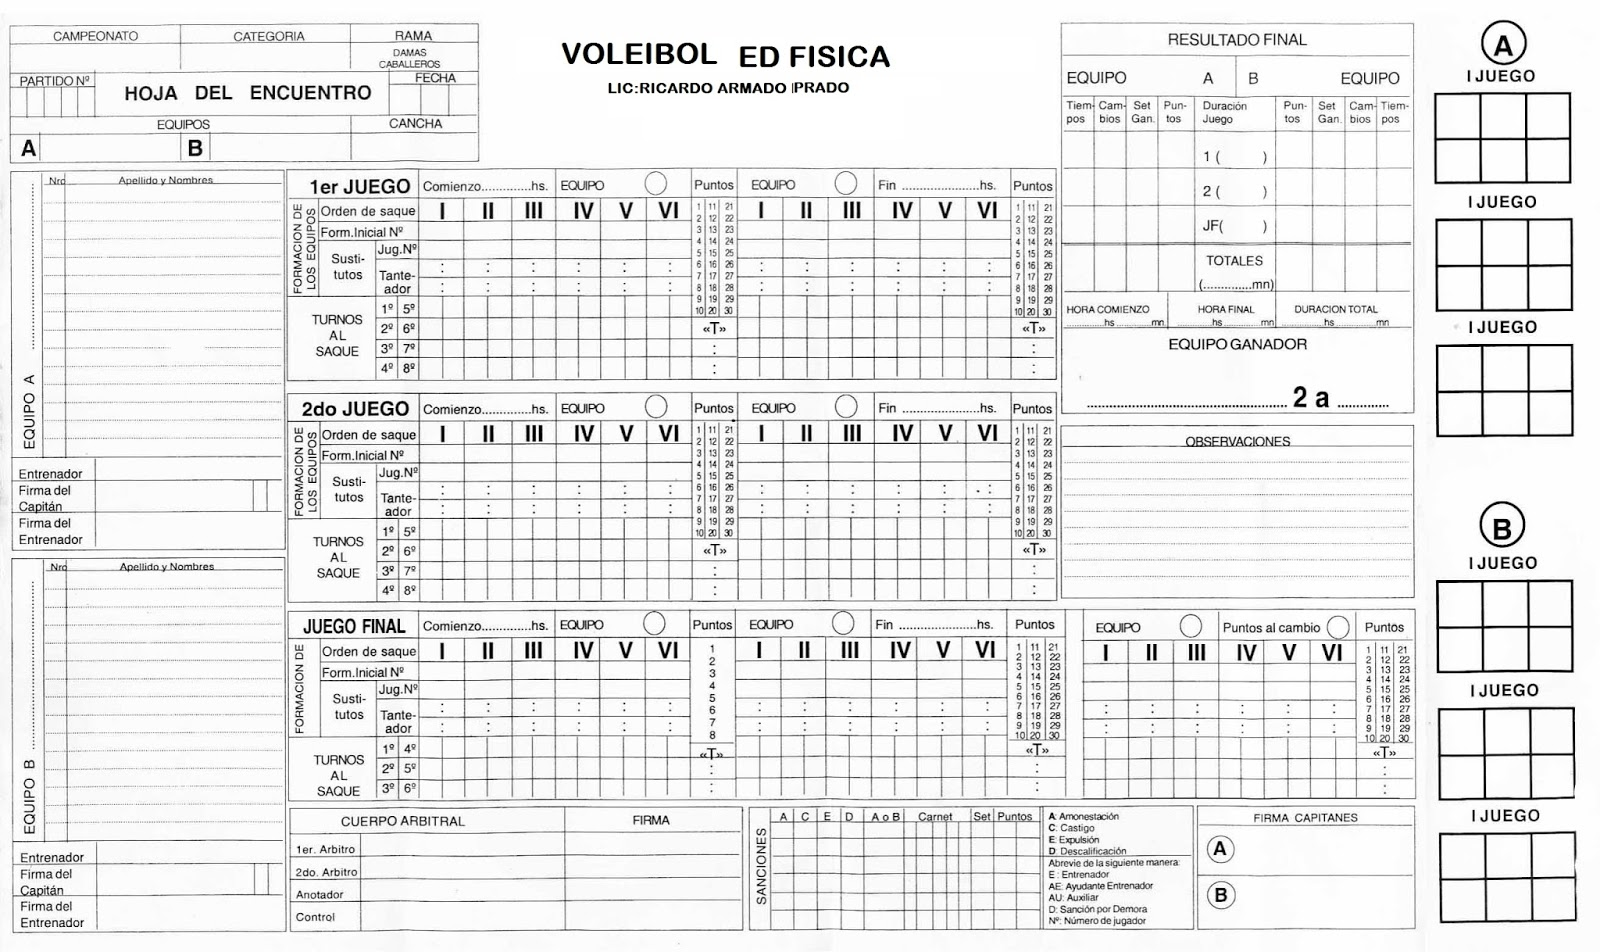 planilla de voleibol descargar facebook